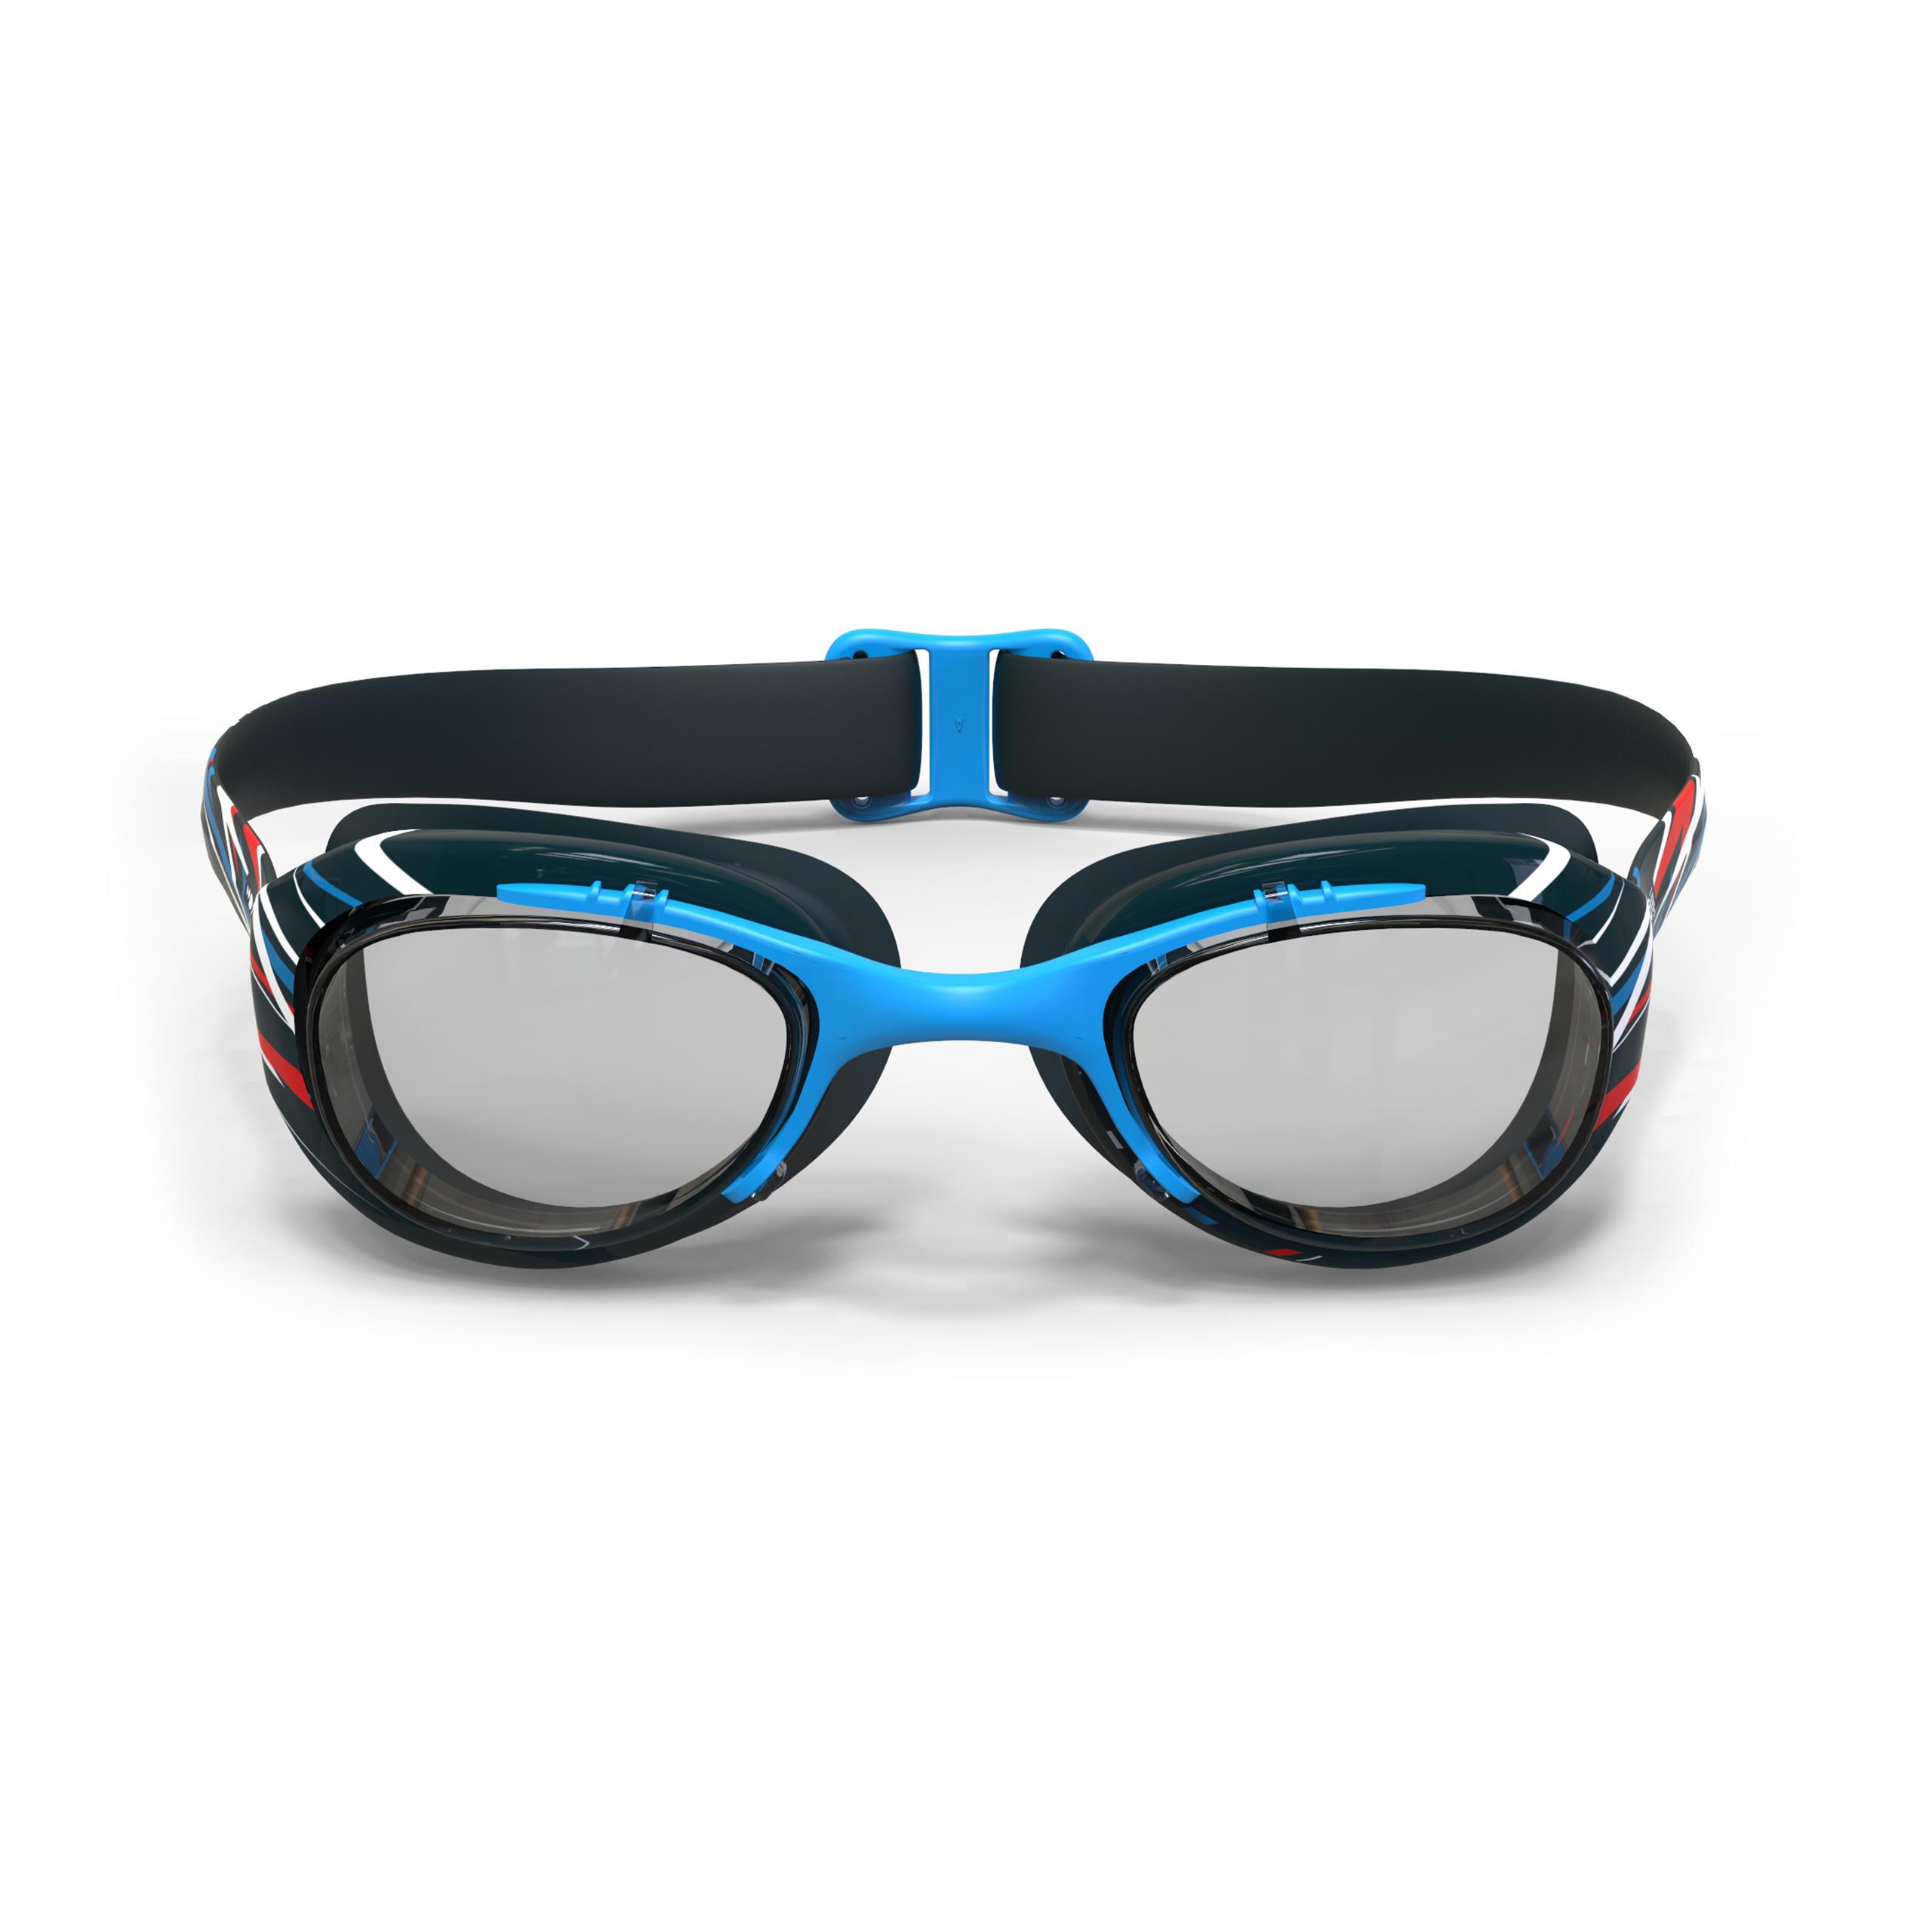 Lunettes de natation XBASE MOTIF Mika bleu Taille G